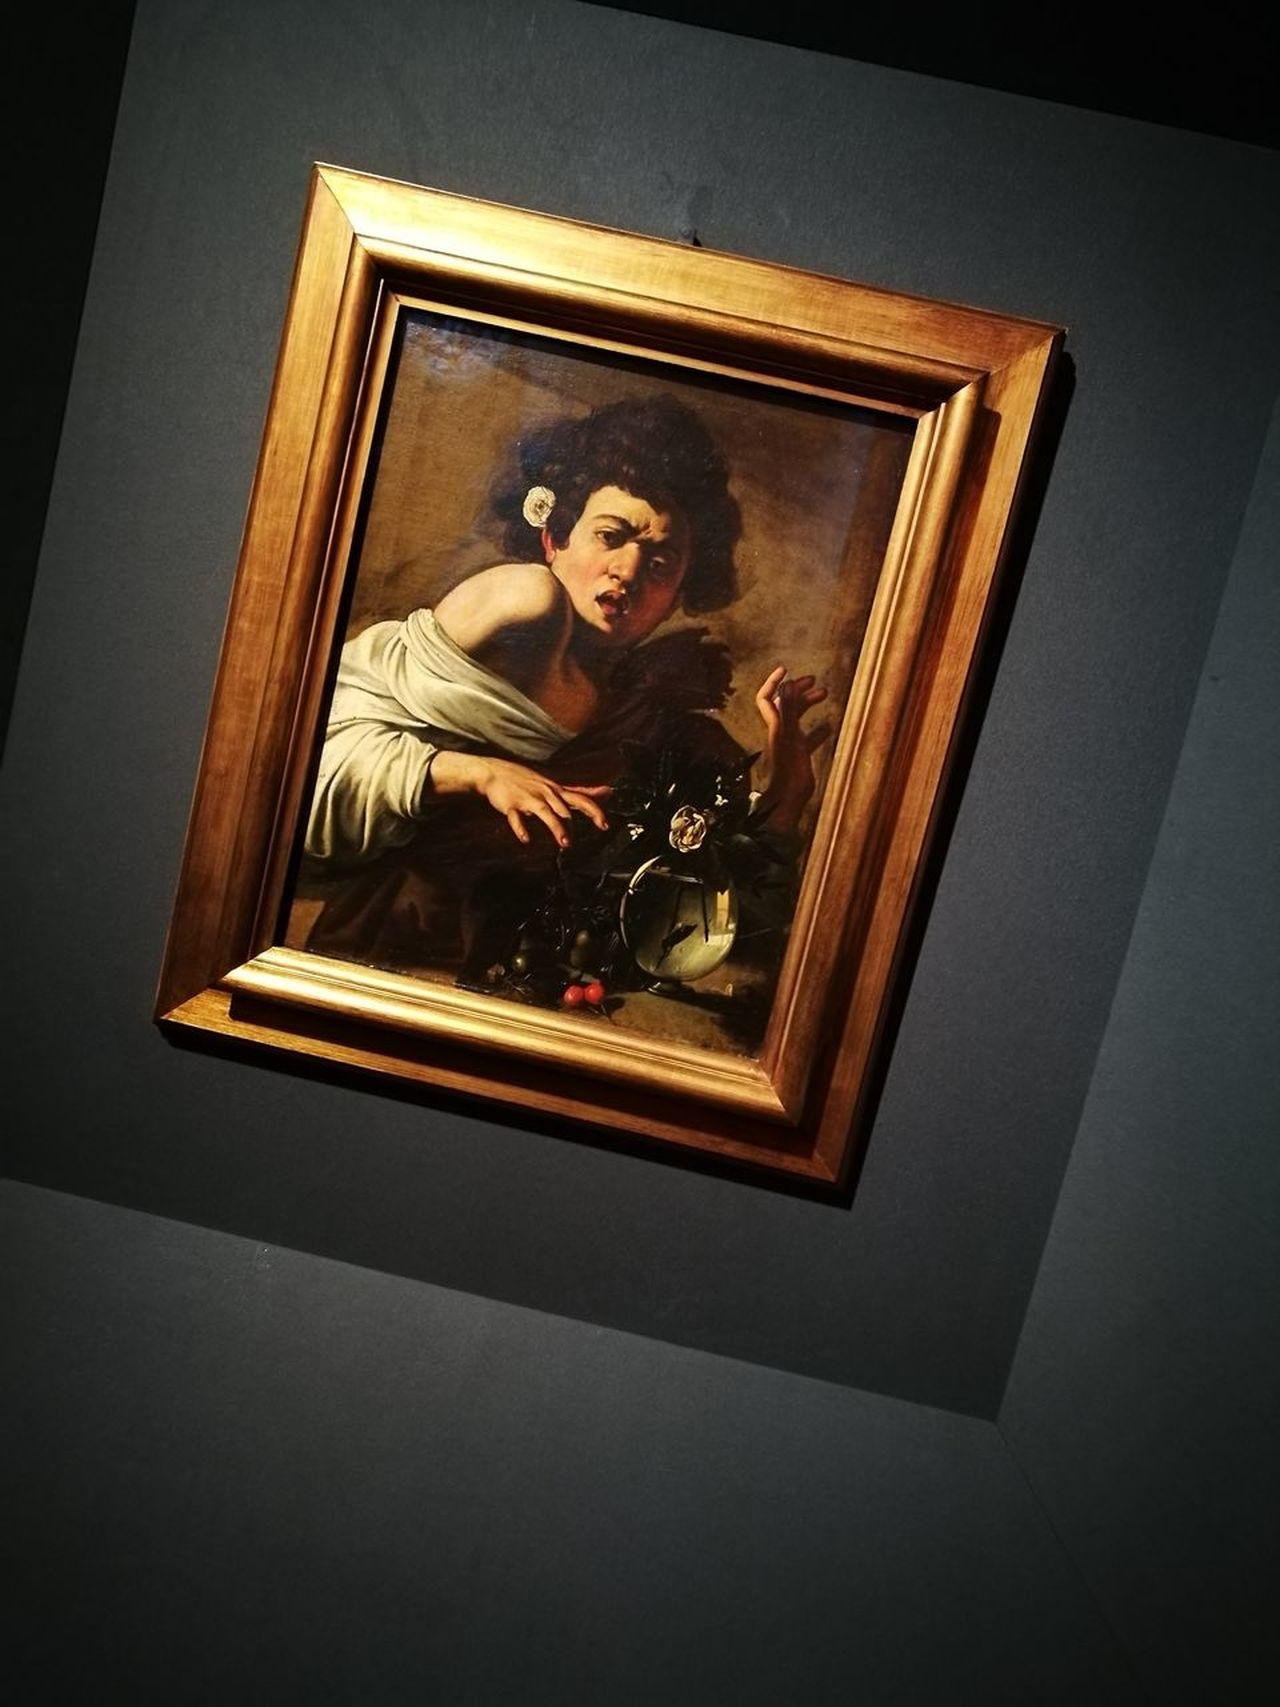 Toptags Followers Followme Like4like Follower Caravaggio Art Arte Likes4likes Likesforlikes Like4follow Follow C4c F4F L4l Toptag